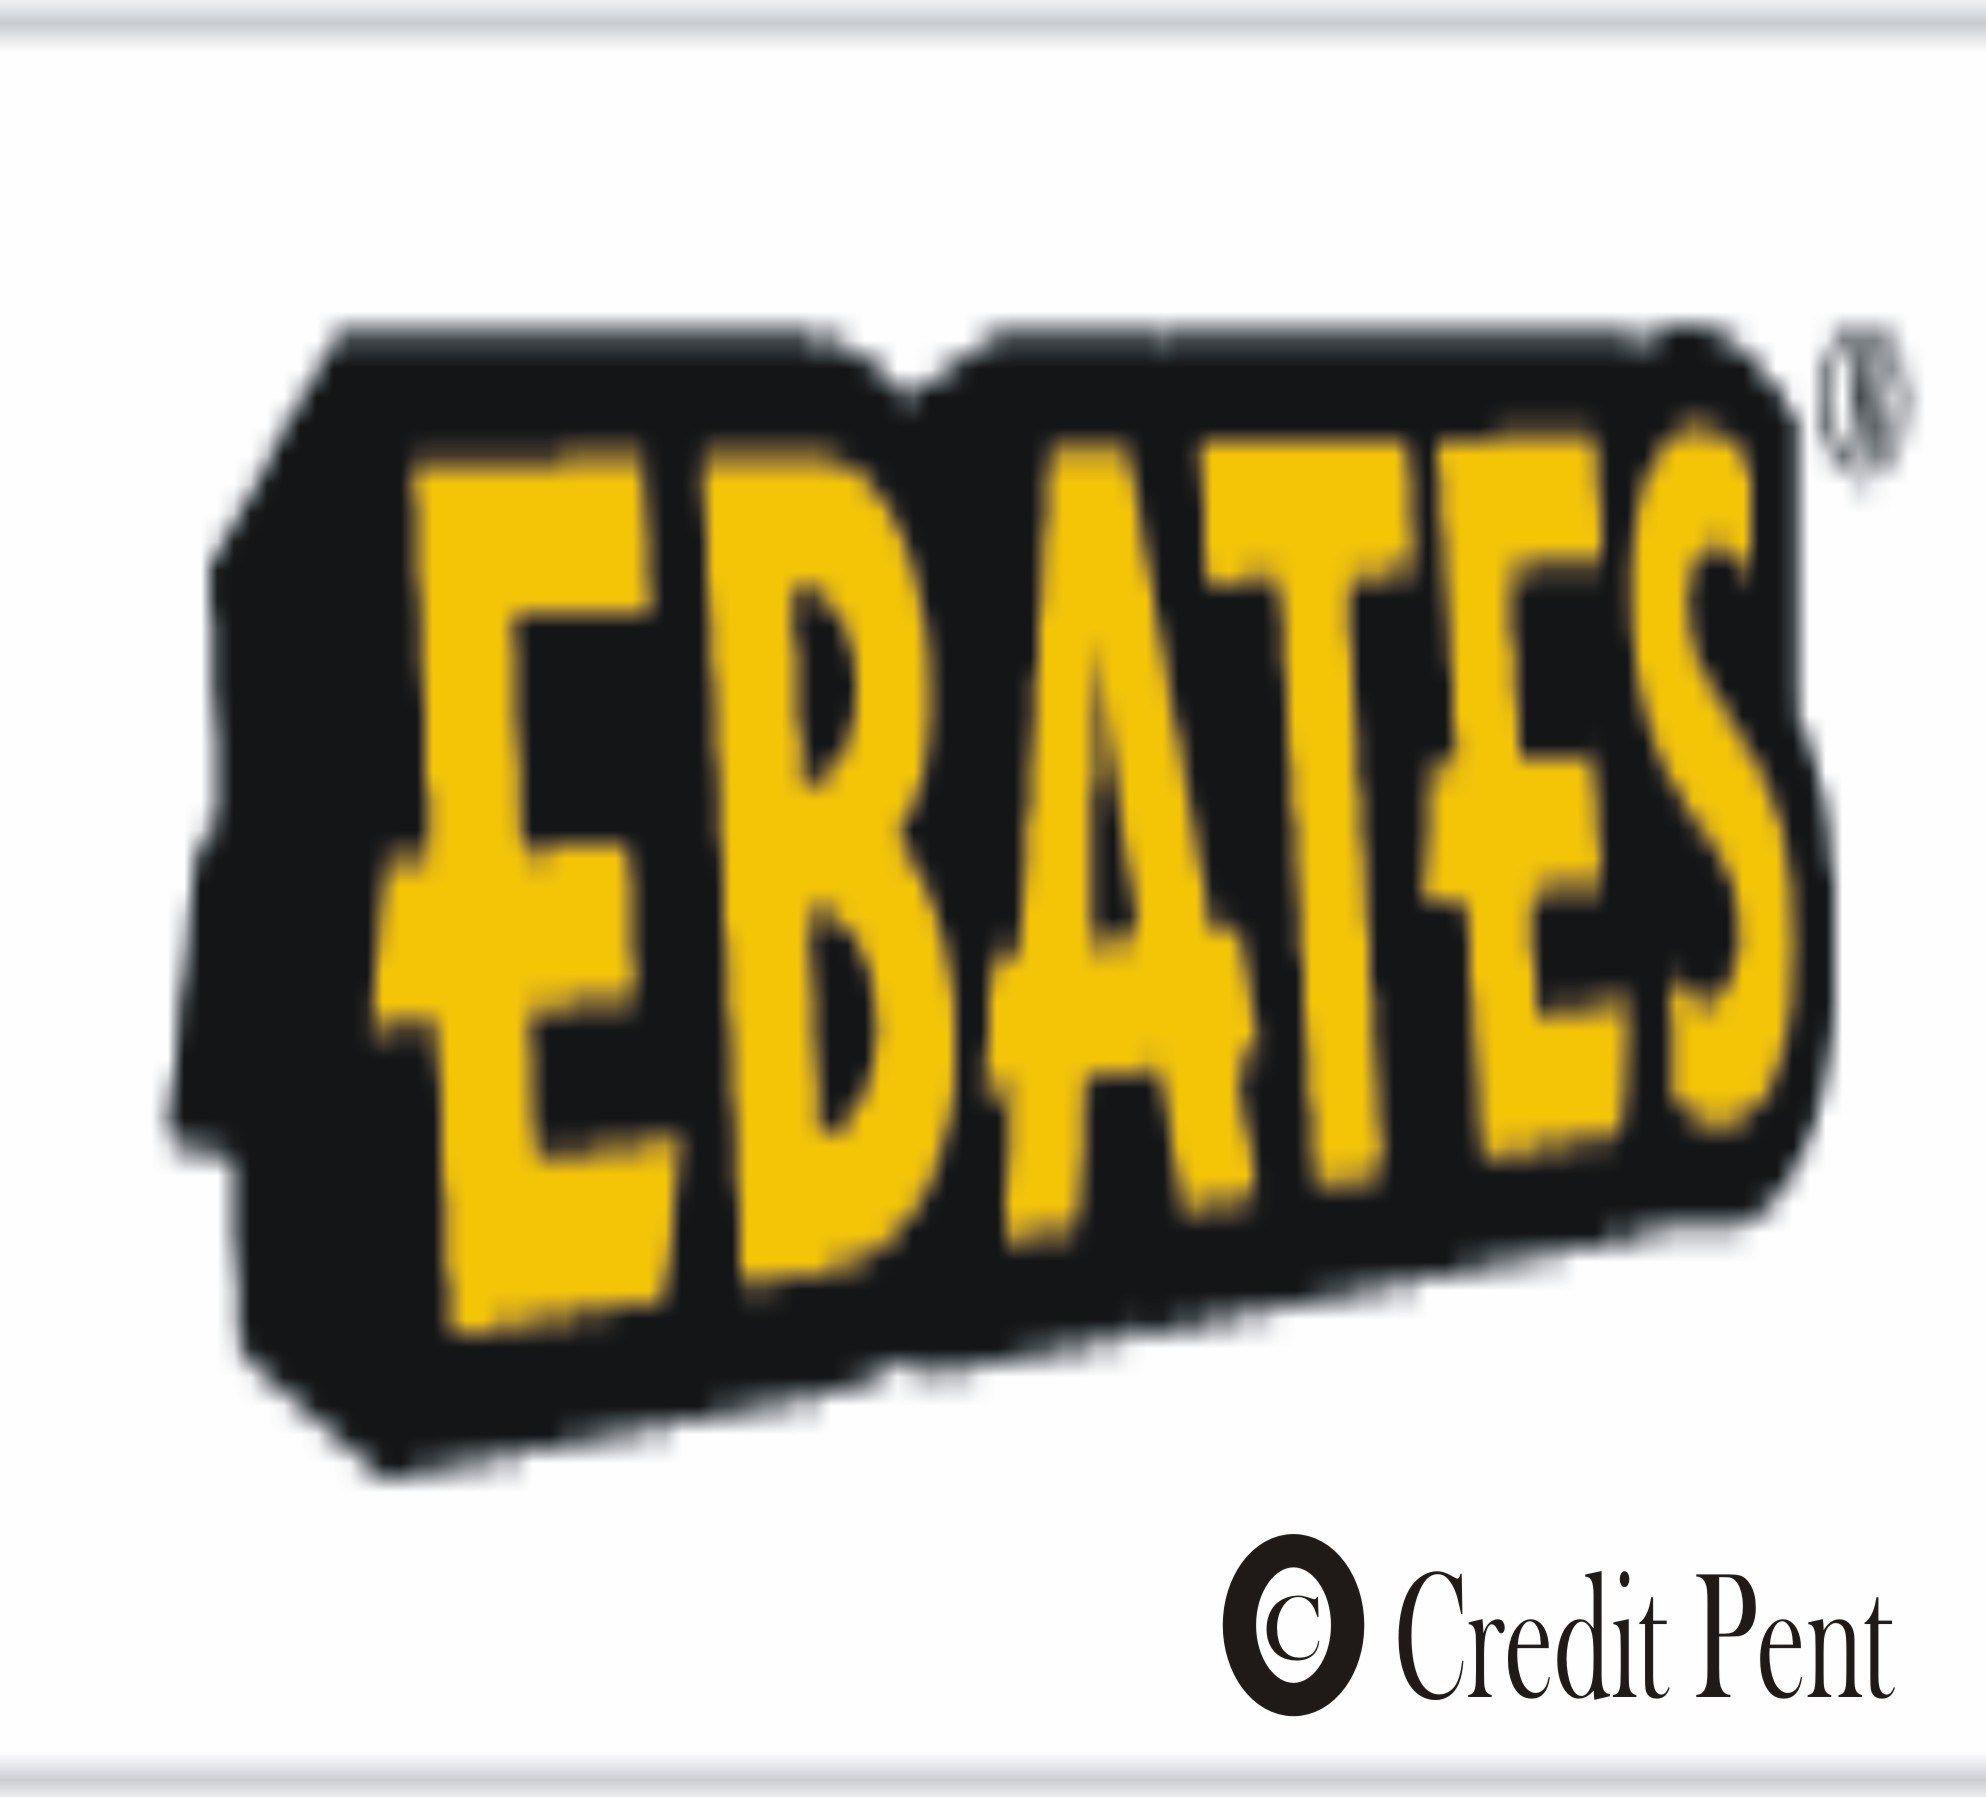 Ebates Credit Card Login Payment Synchrony Bank Login Bank Credit Cards Ebates Credit Card